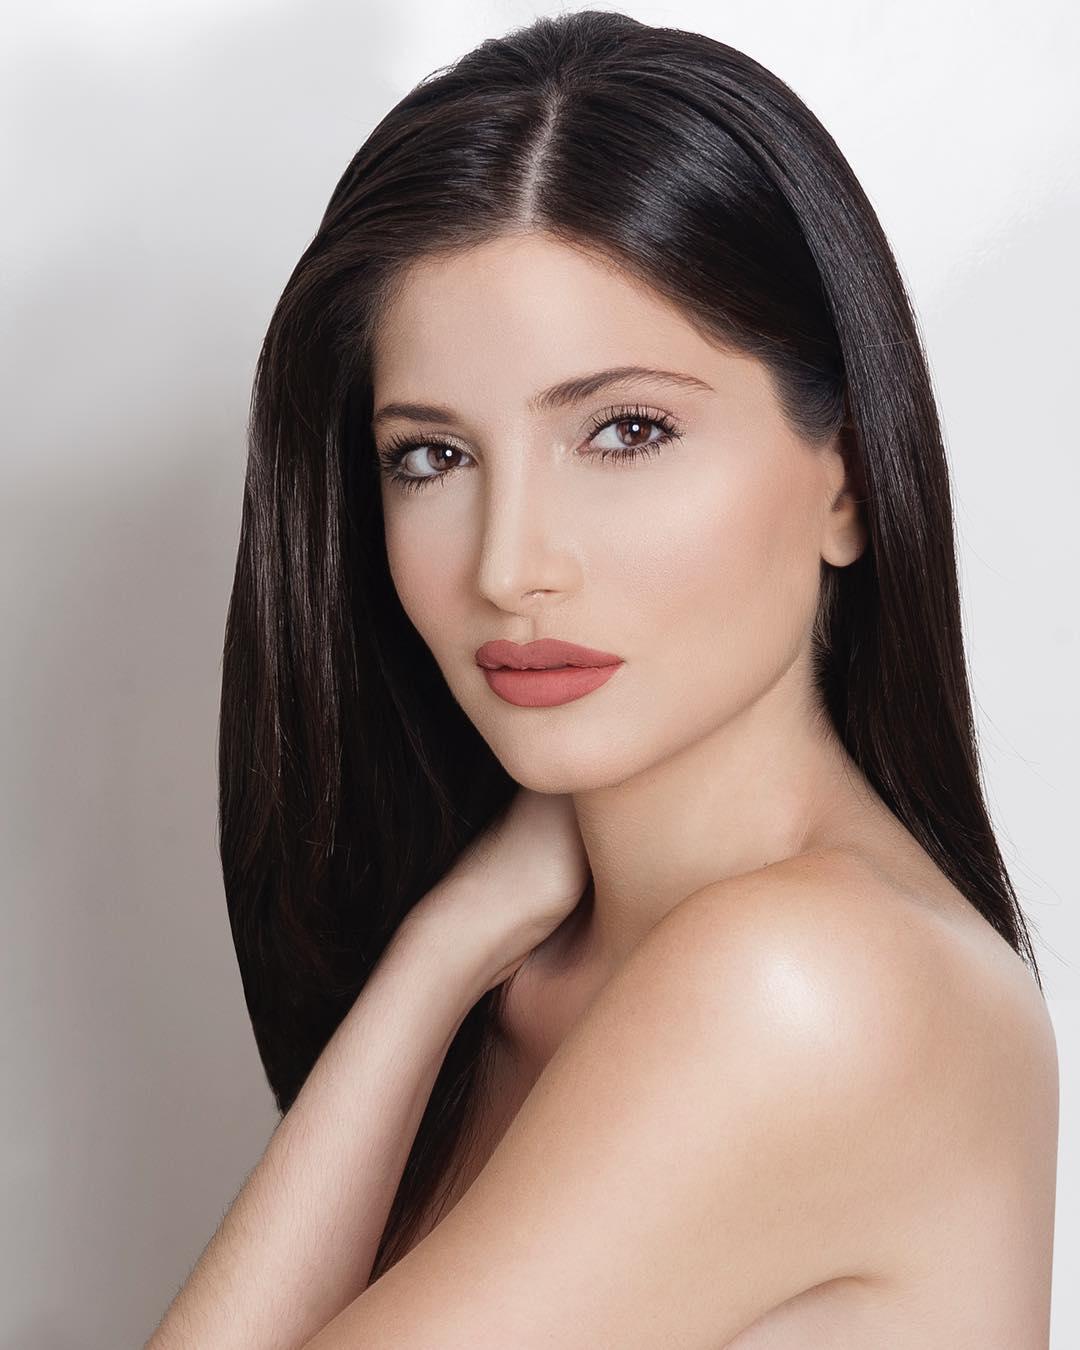 nariman battikha, reyna hispanoamericana 2018/top 10 de miss supranational 2018. 40763810